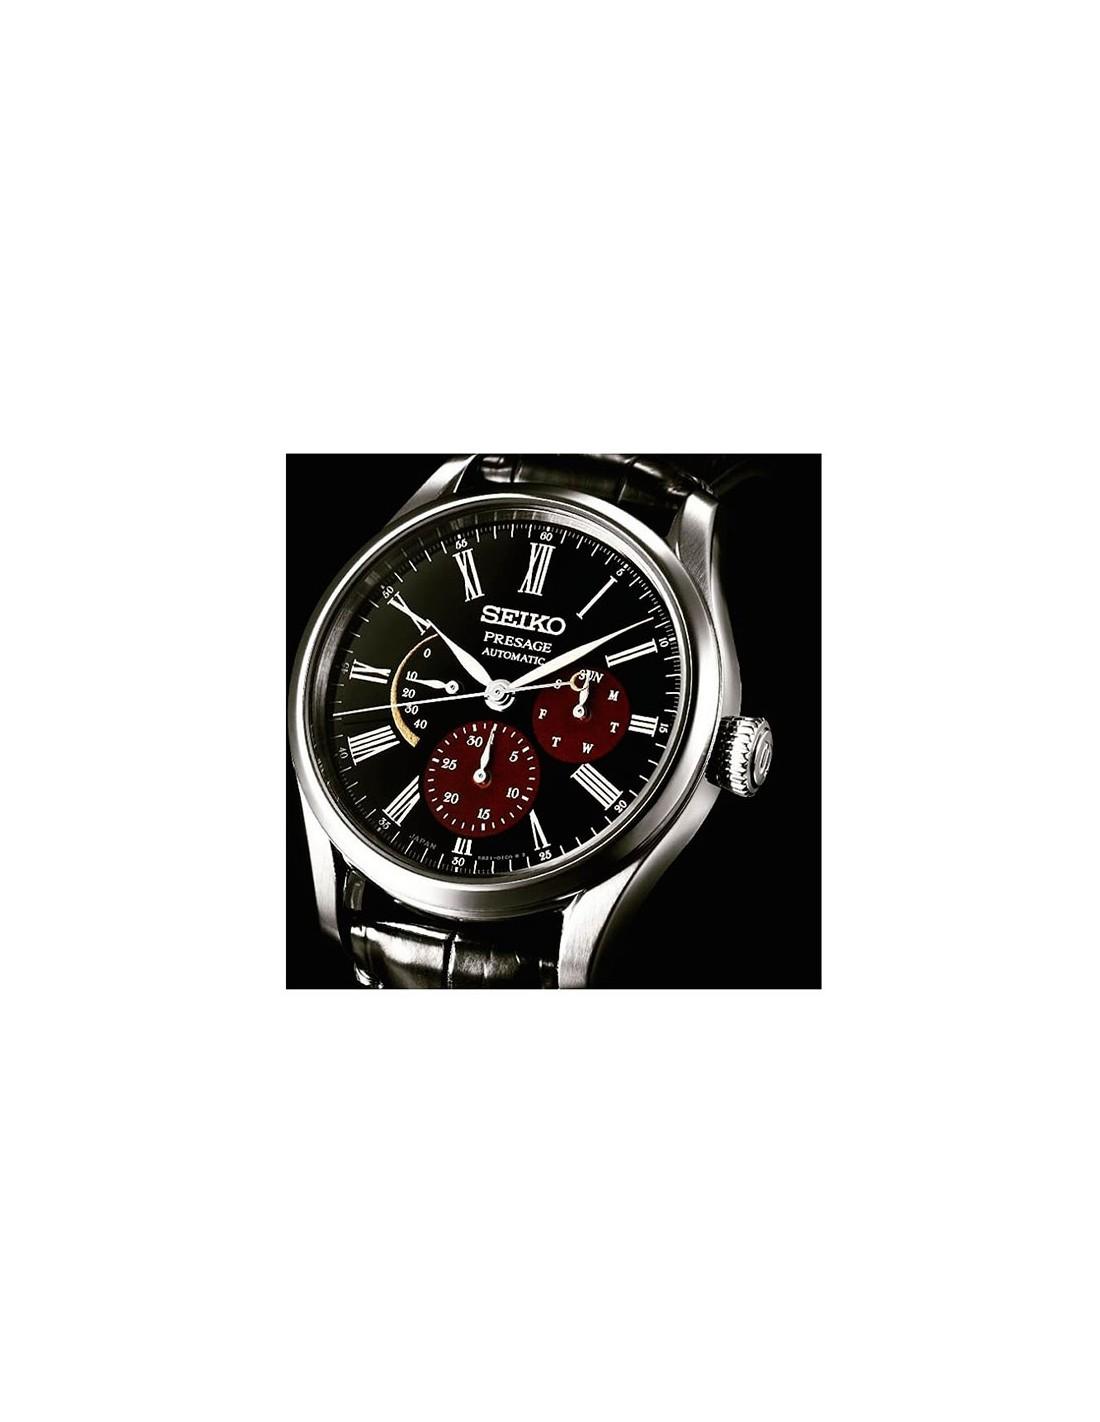 9c1116f0539b ... Reloj SPB085J1 Seiko Automático Presage Limited Edition